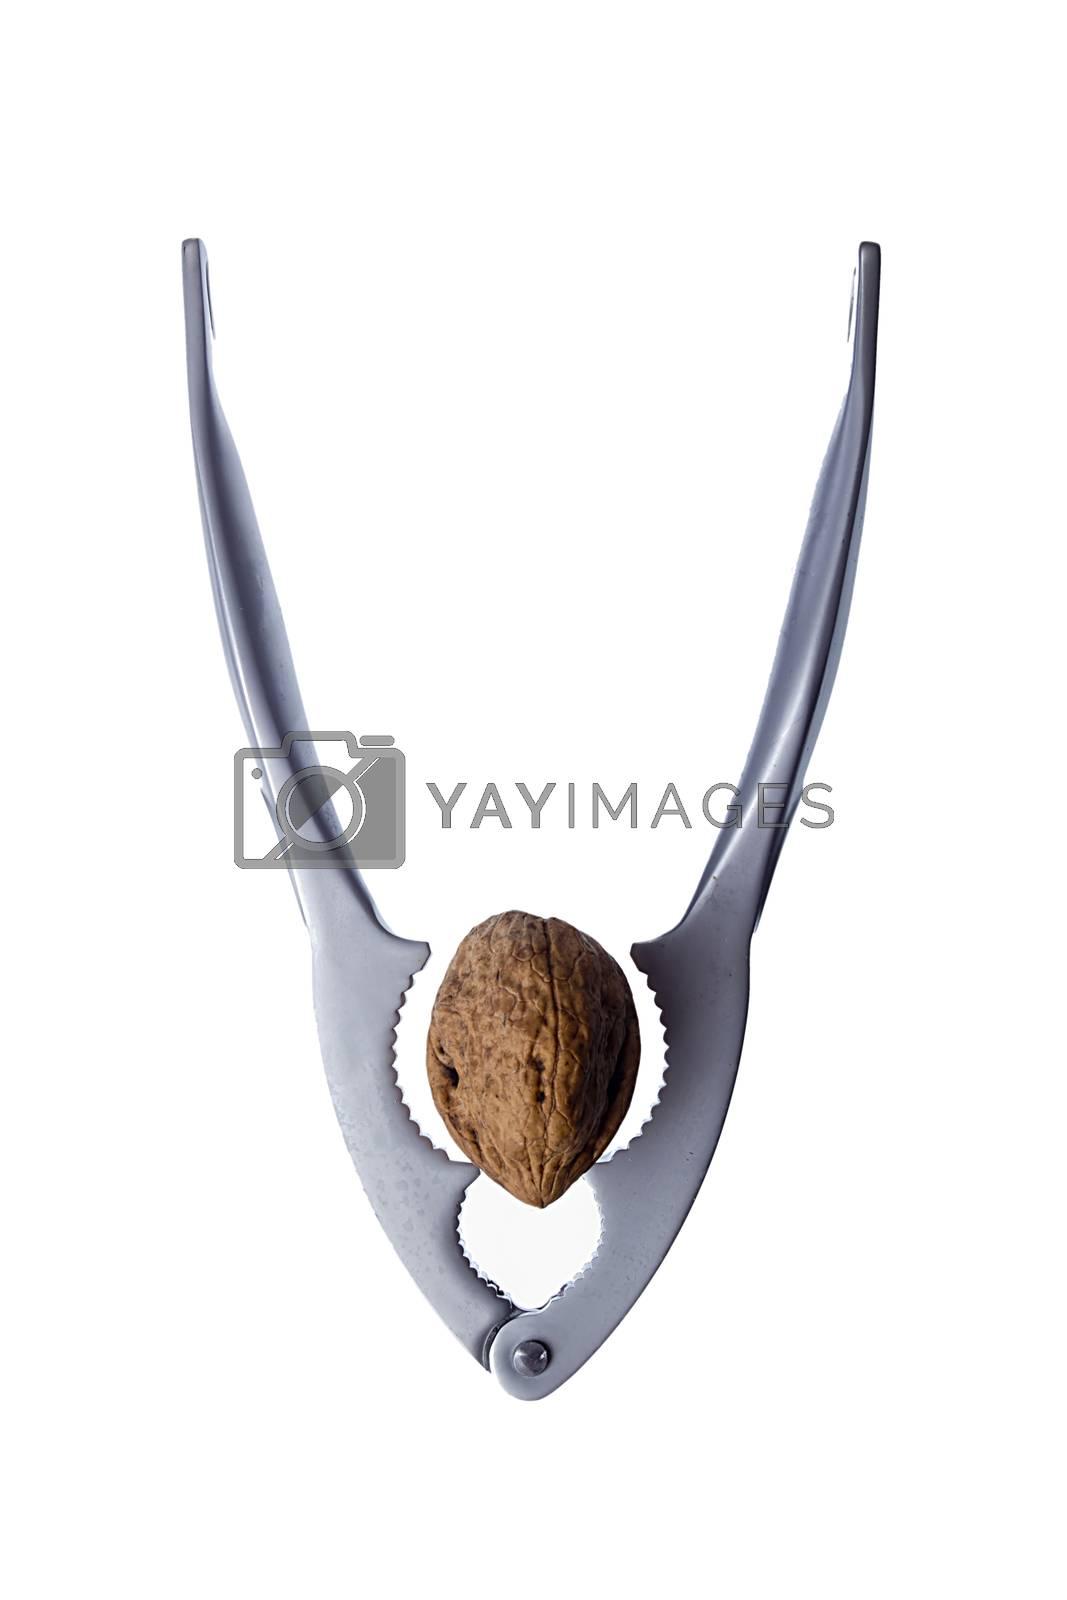 Steel nutcracker and walnut on white background